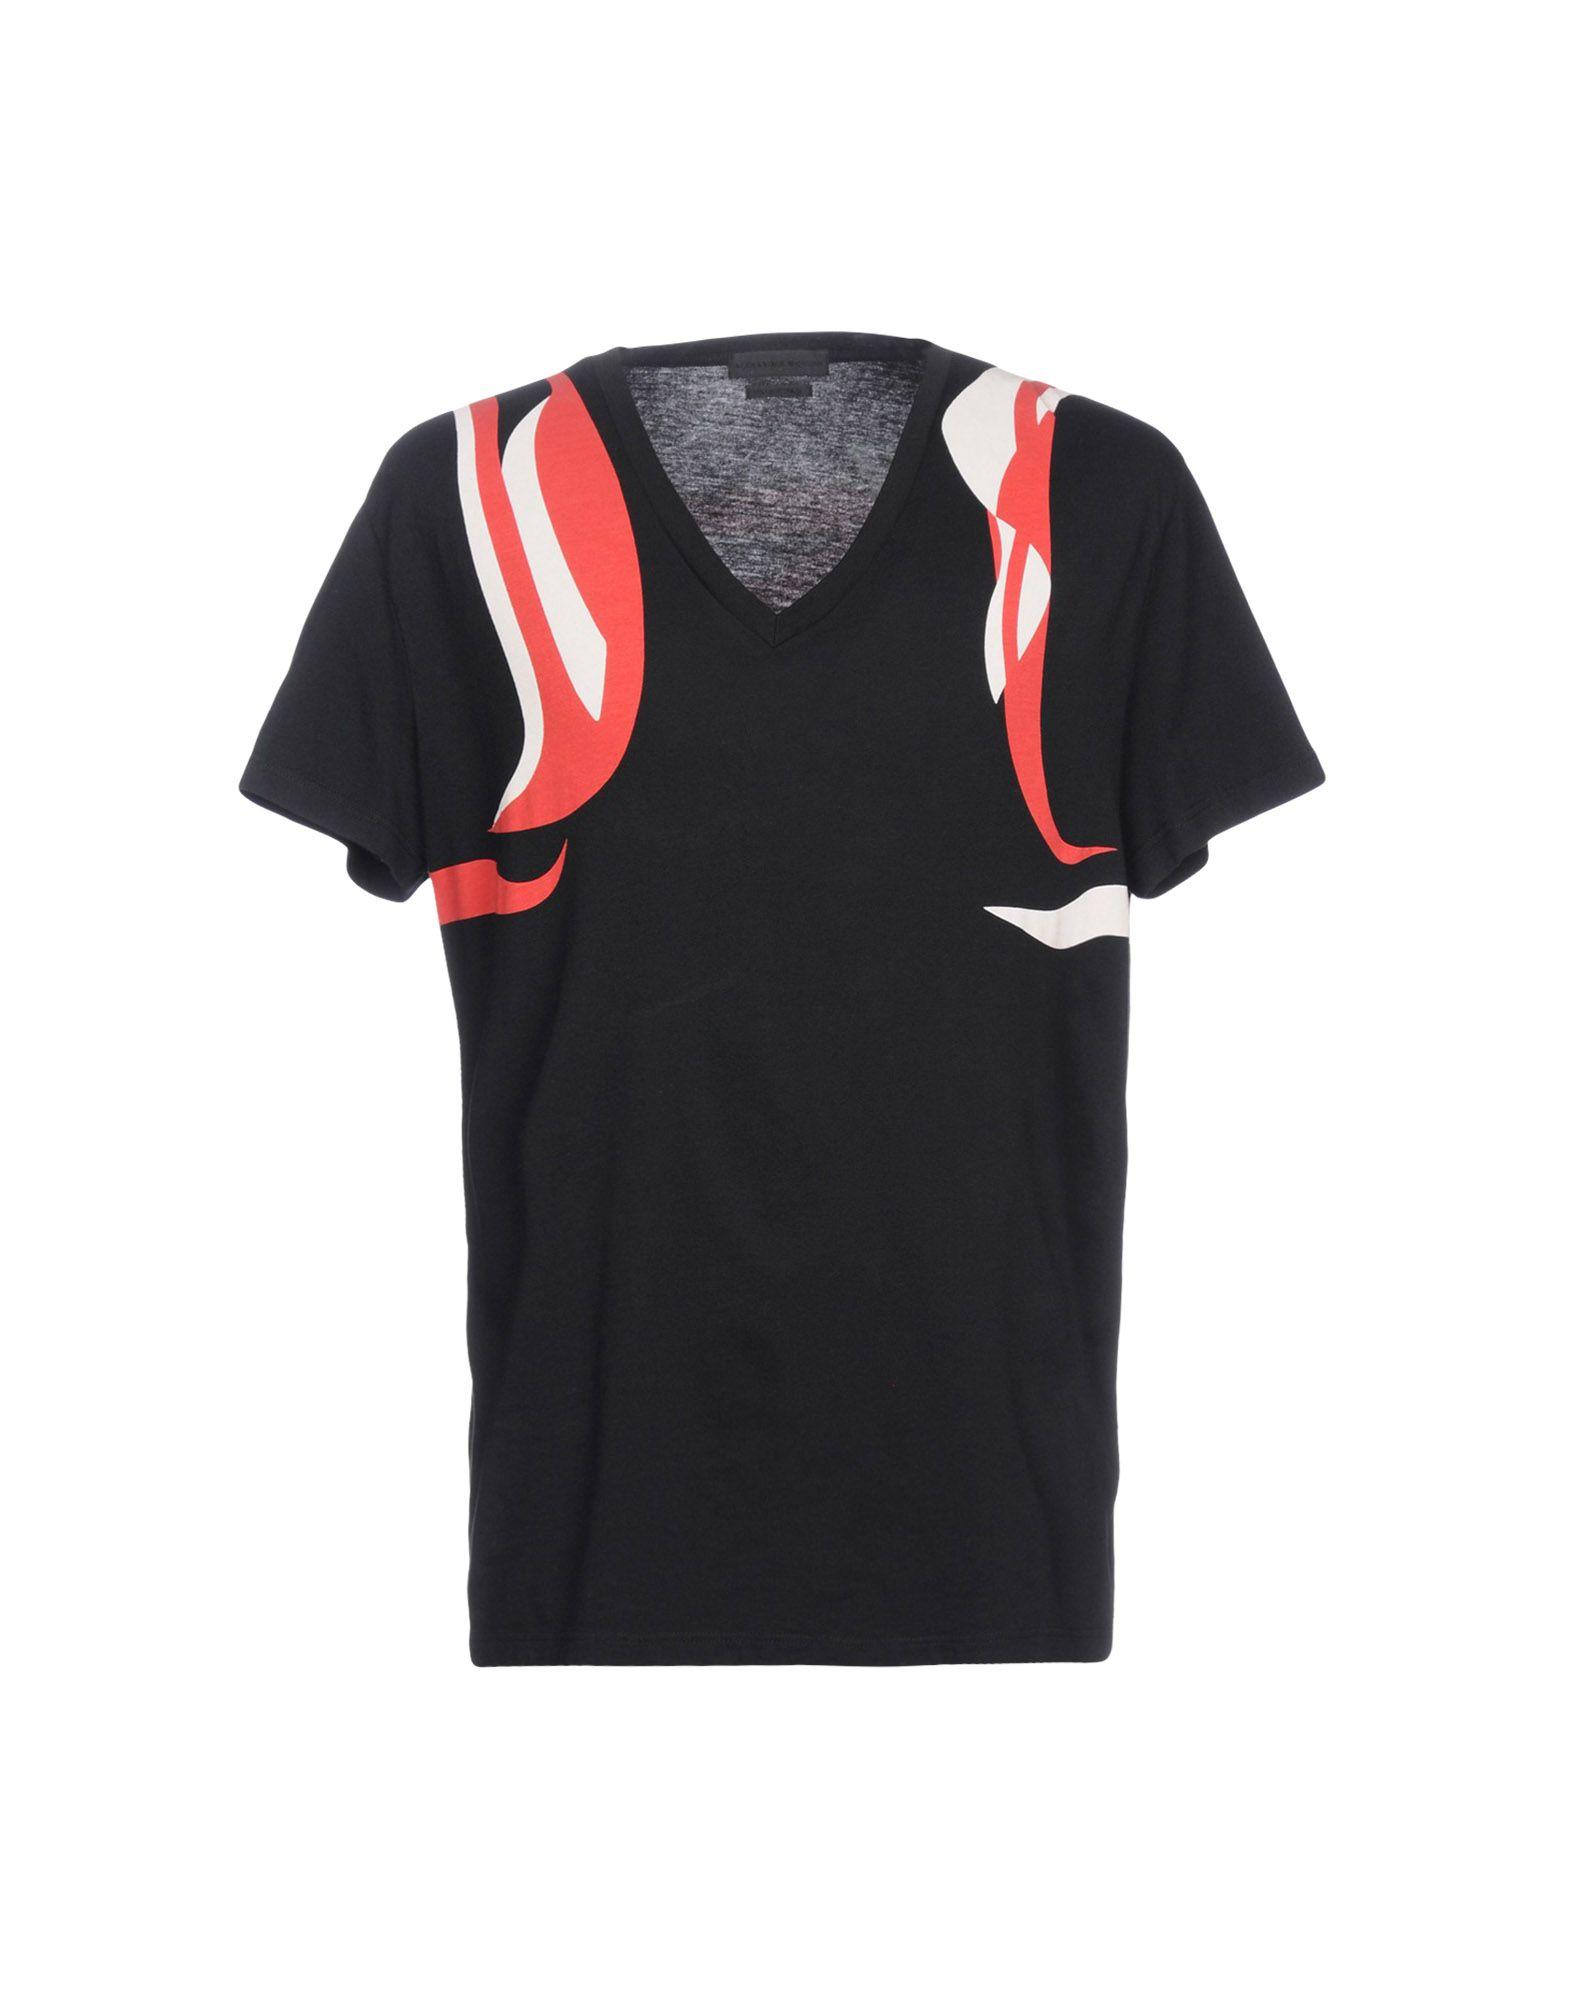 T-Shirt Alexander Mcqueen Uomo - Acquista online su